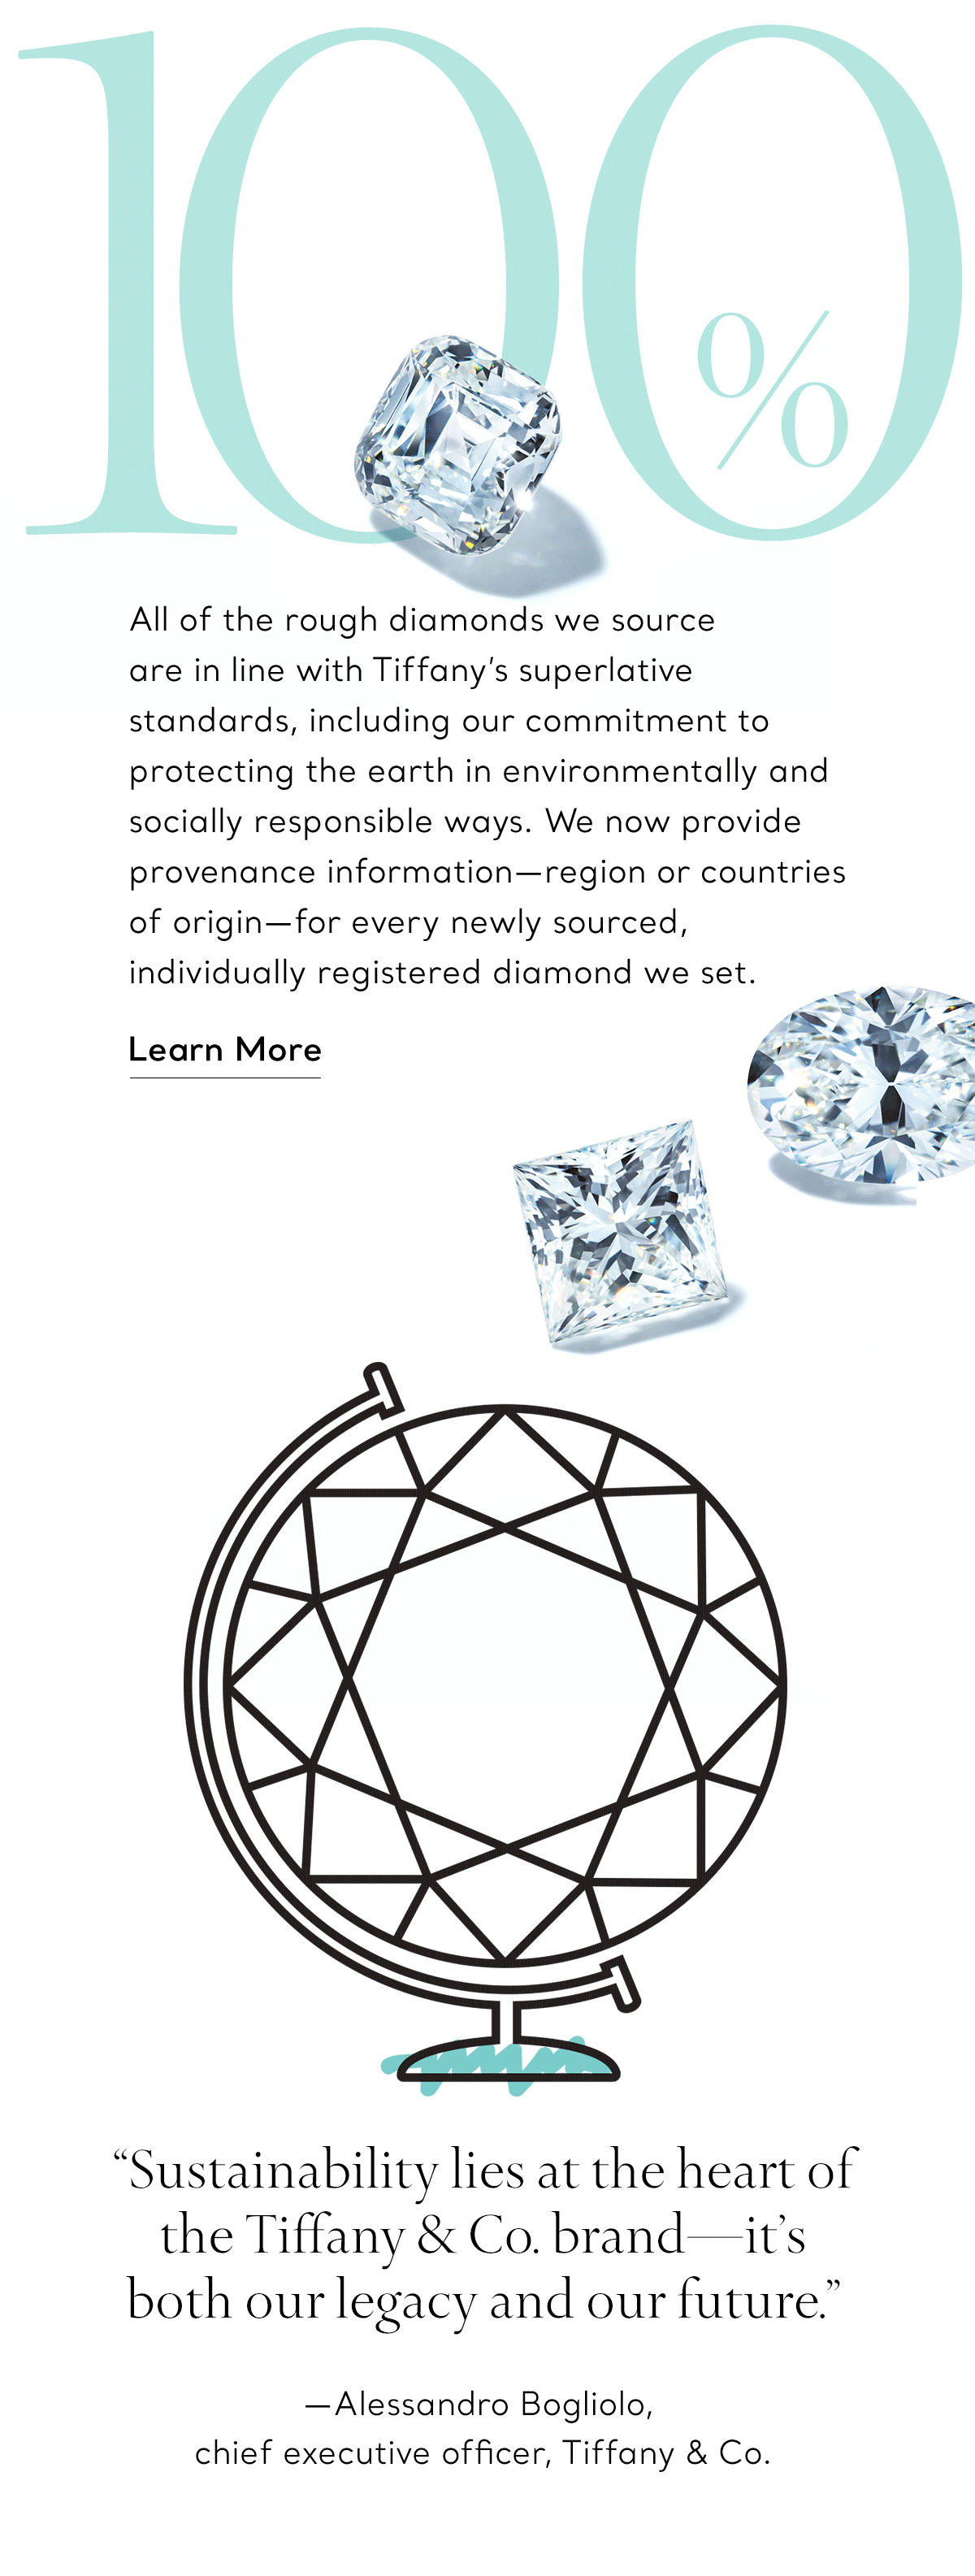 Learn More - Diamond Provenance